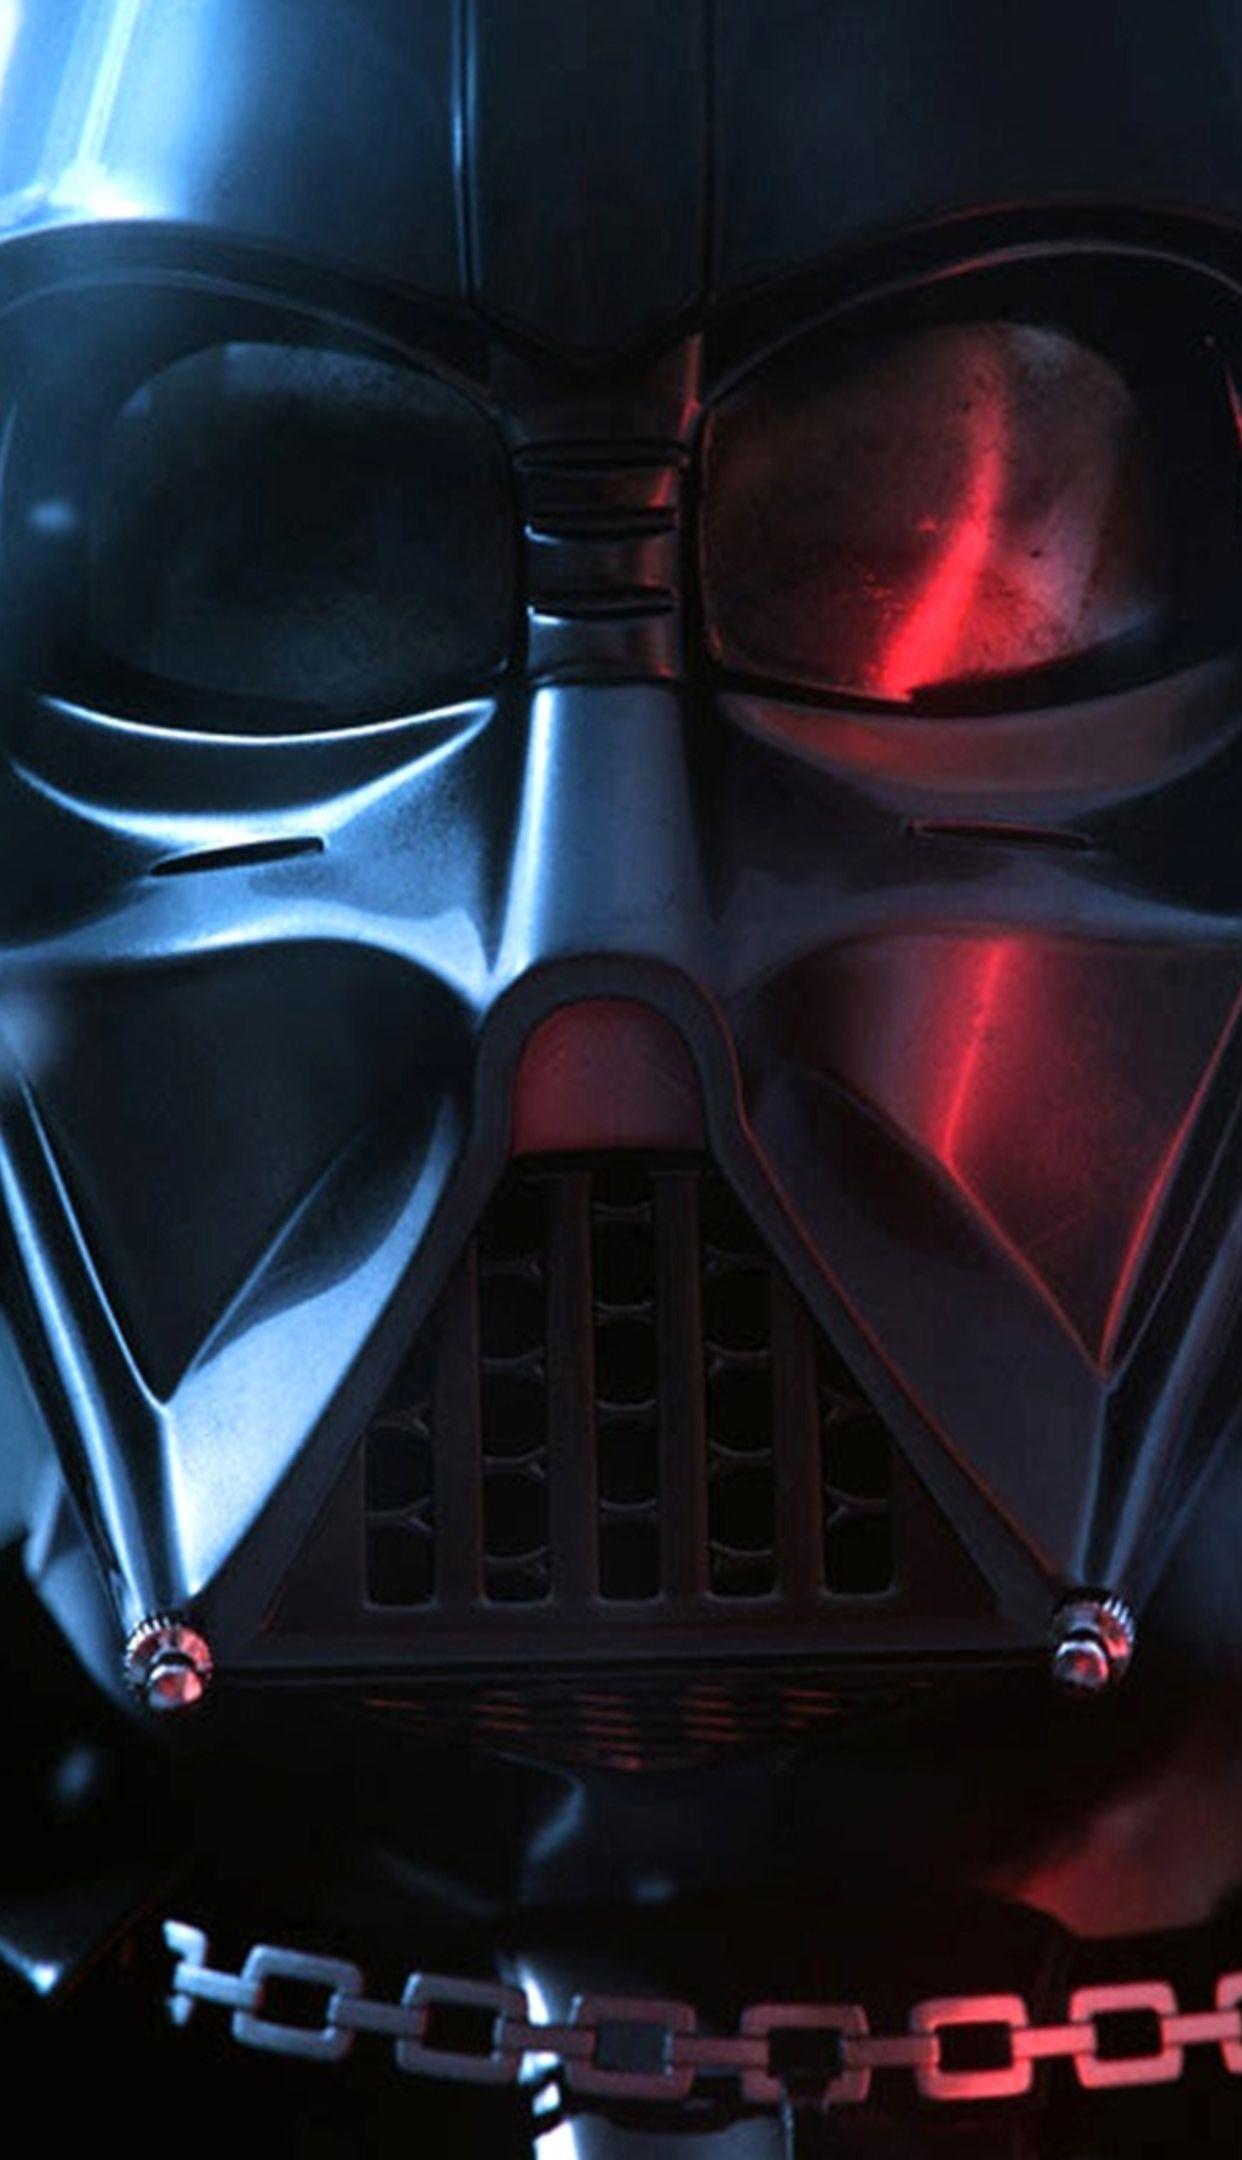 Free Download Wallpprs Darth Vader 1242x2208 4k Hd Wallpaper